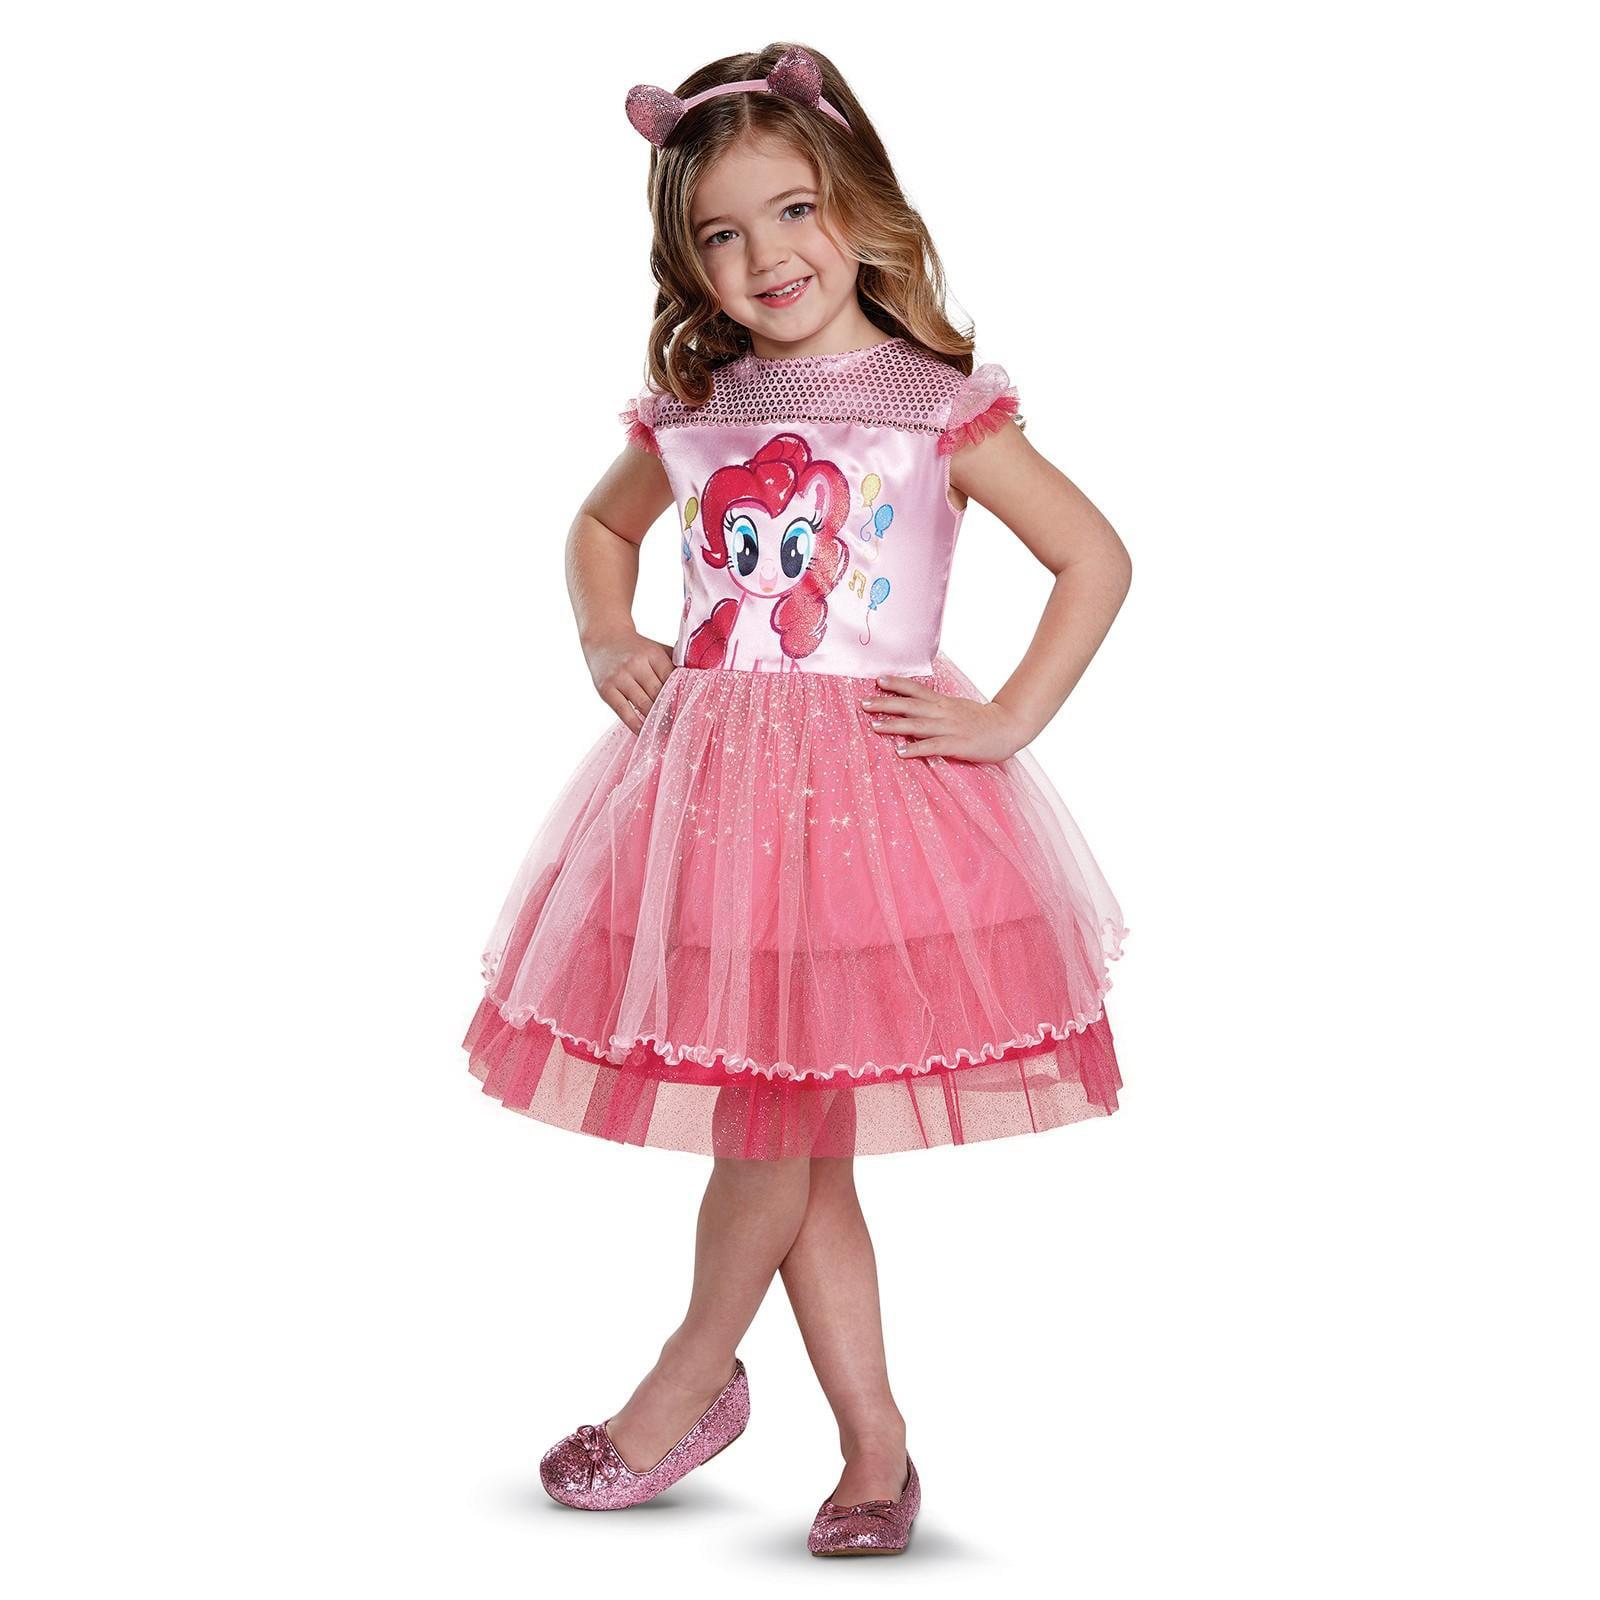 2T My Little Pony Twilight Sparkle Toddler Girls Costume Ruffle Dress Lilac